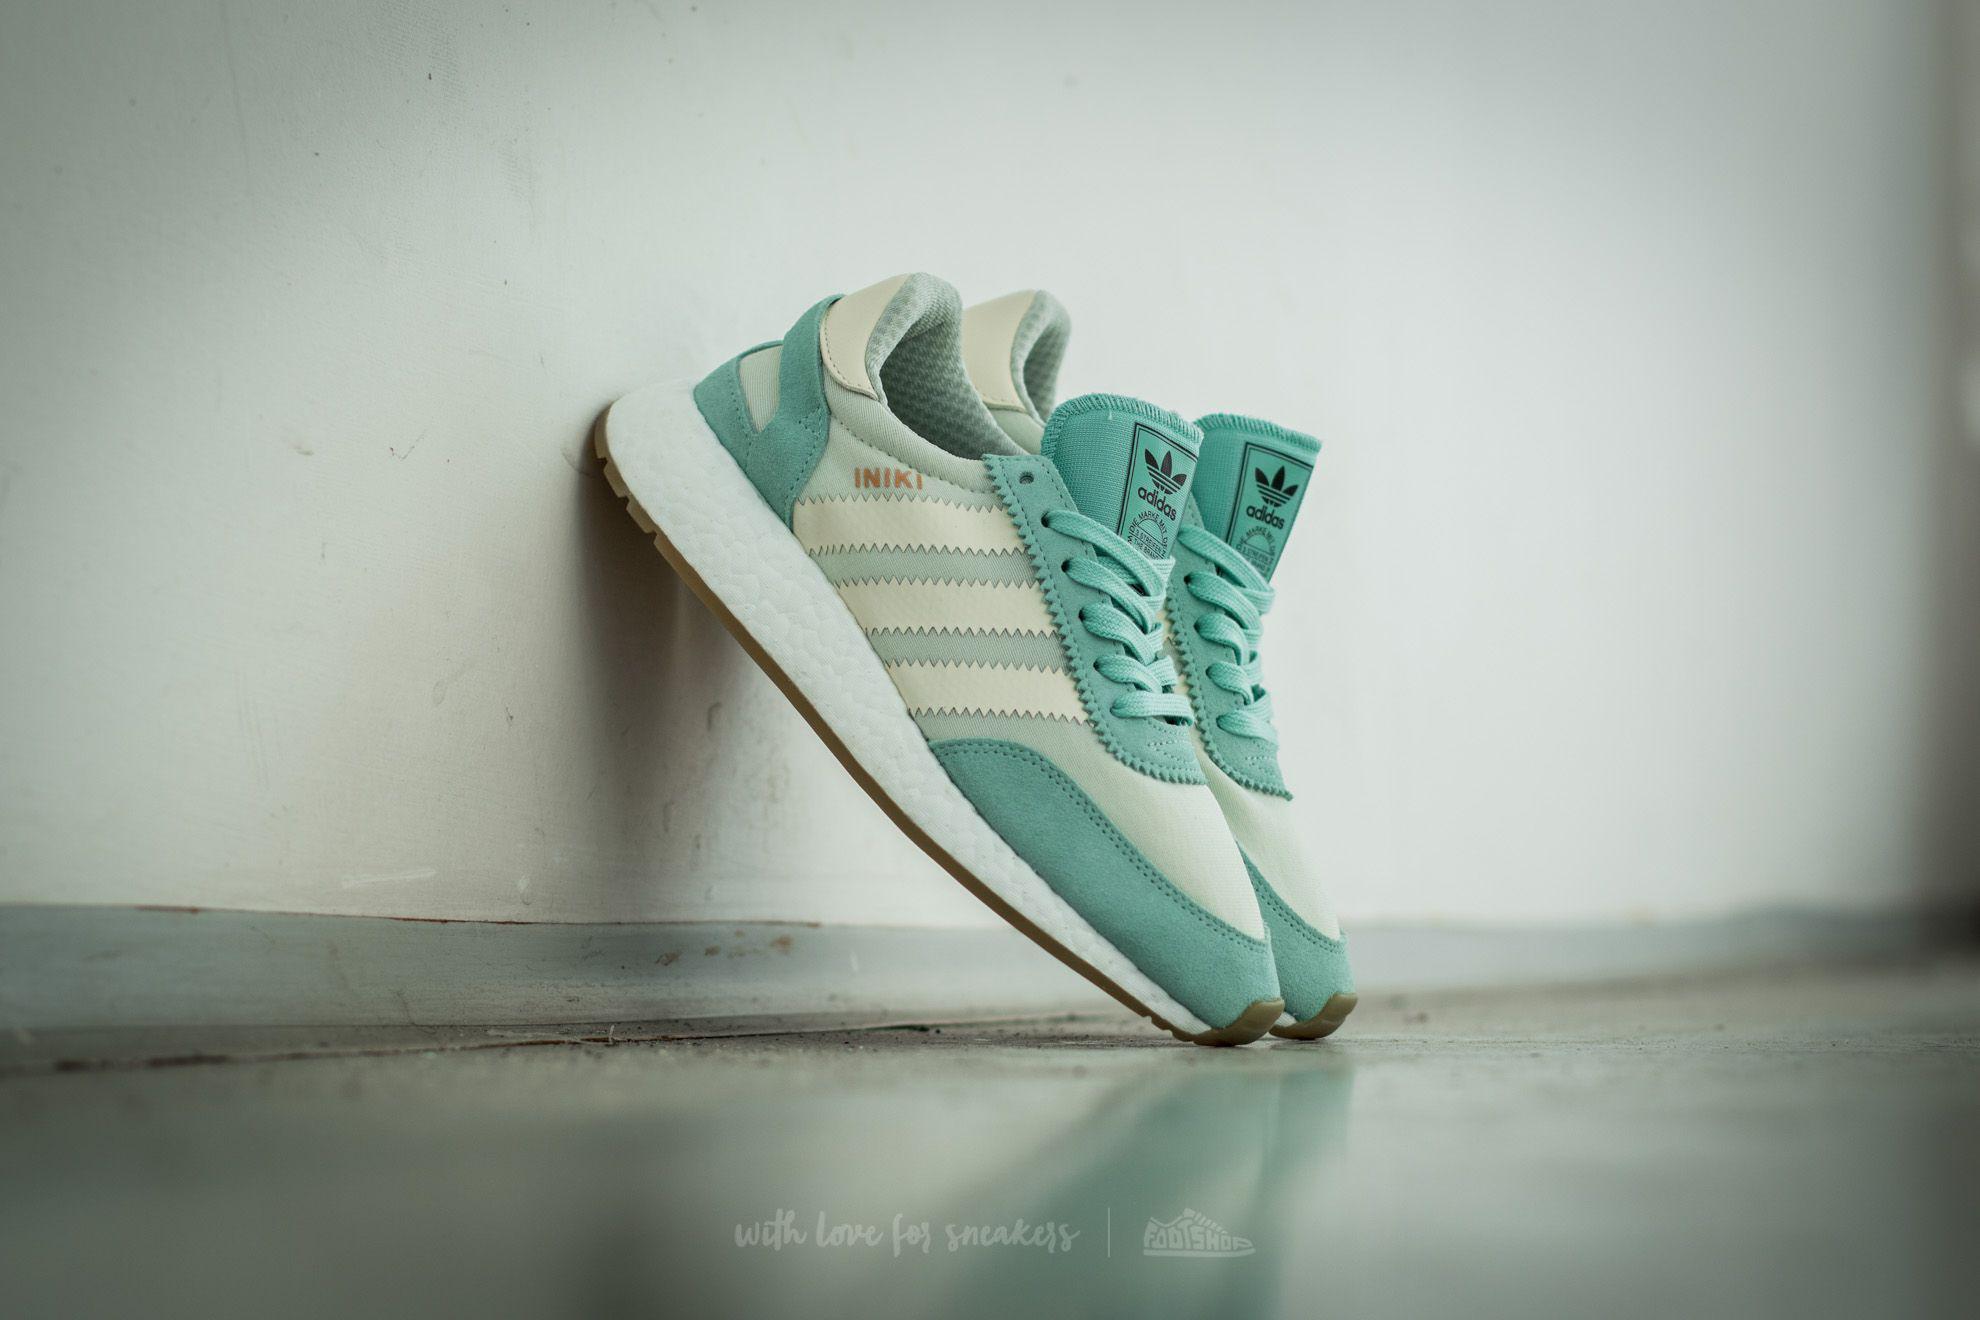 lyst adidas originali adidas iniki runner w facile verde / crema